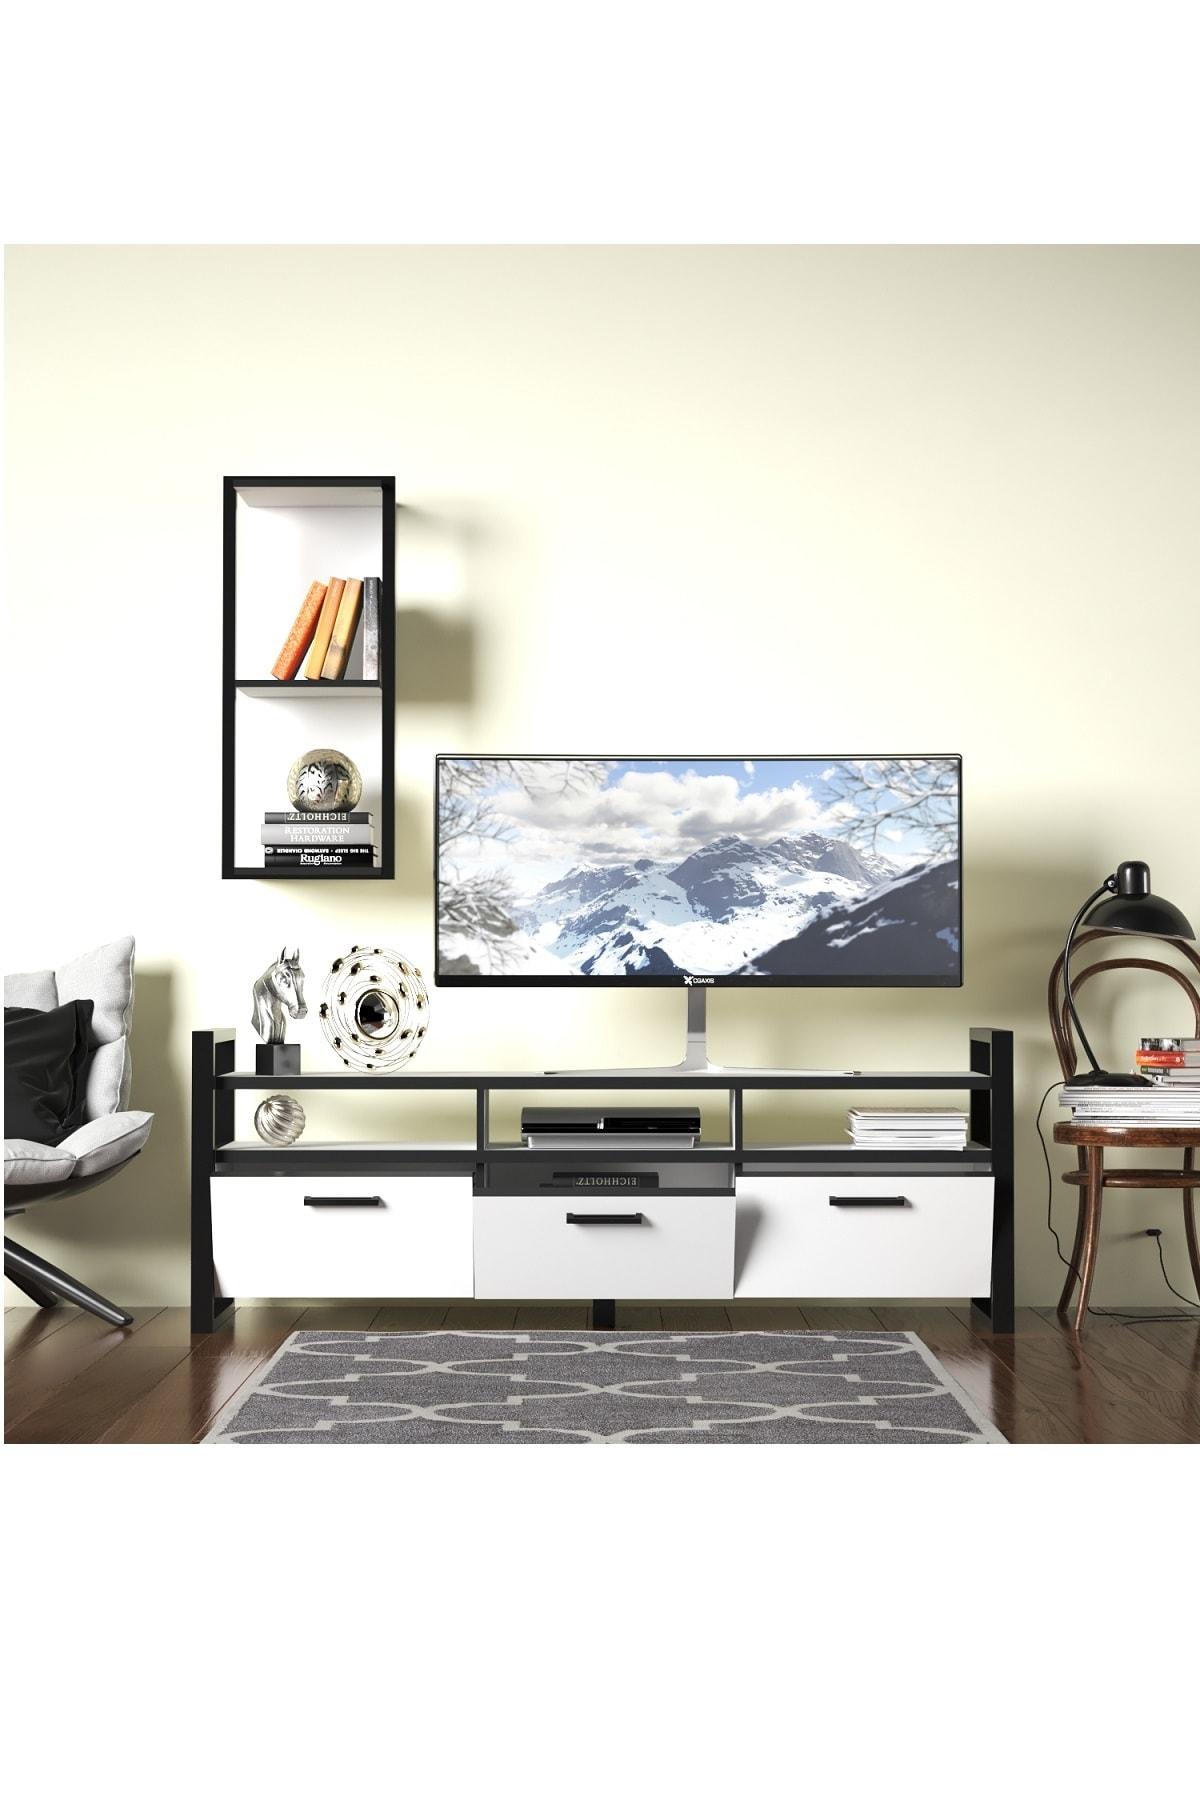 Evdemo Sedef Tv Sehpası Tv Ünitesi Beyaz Siyah 0